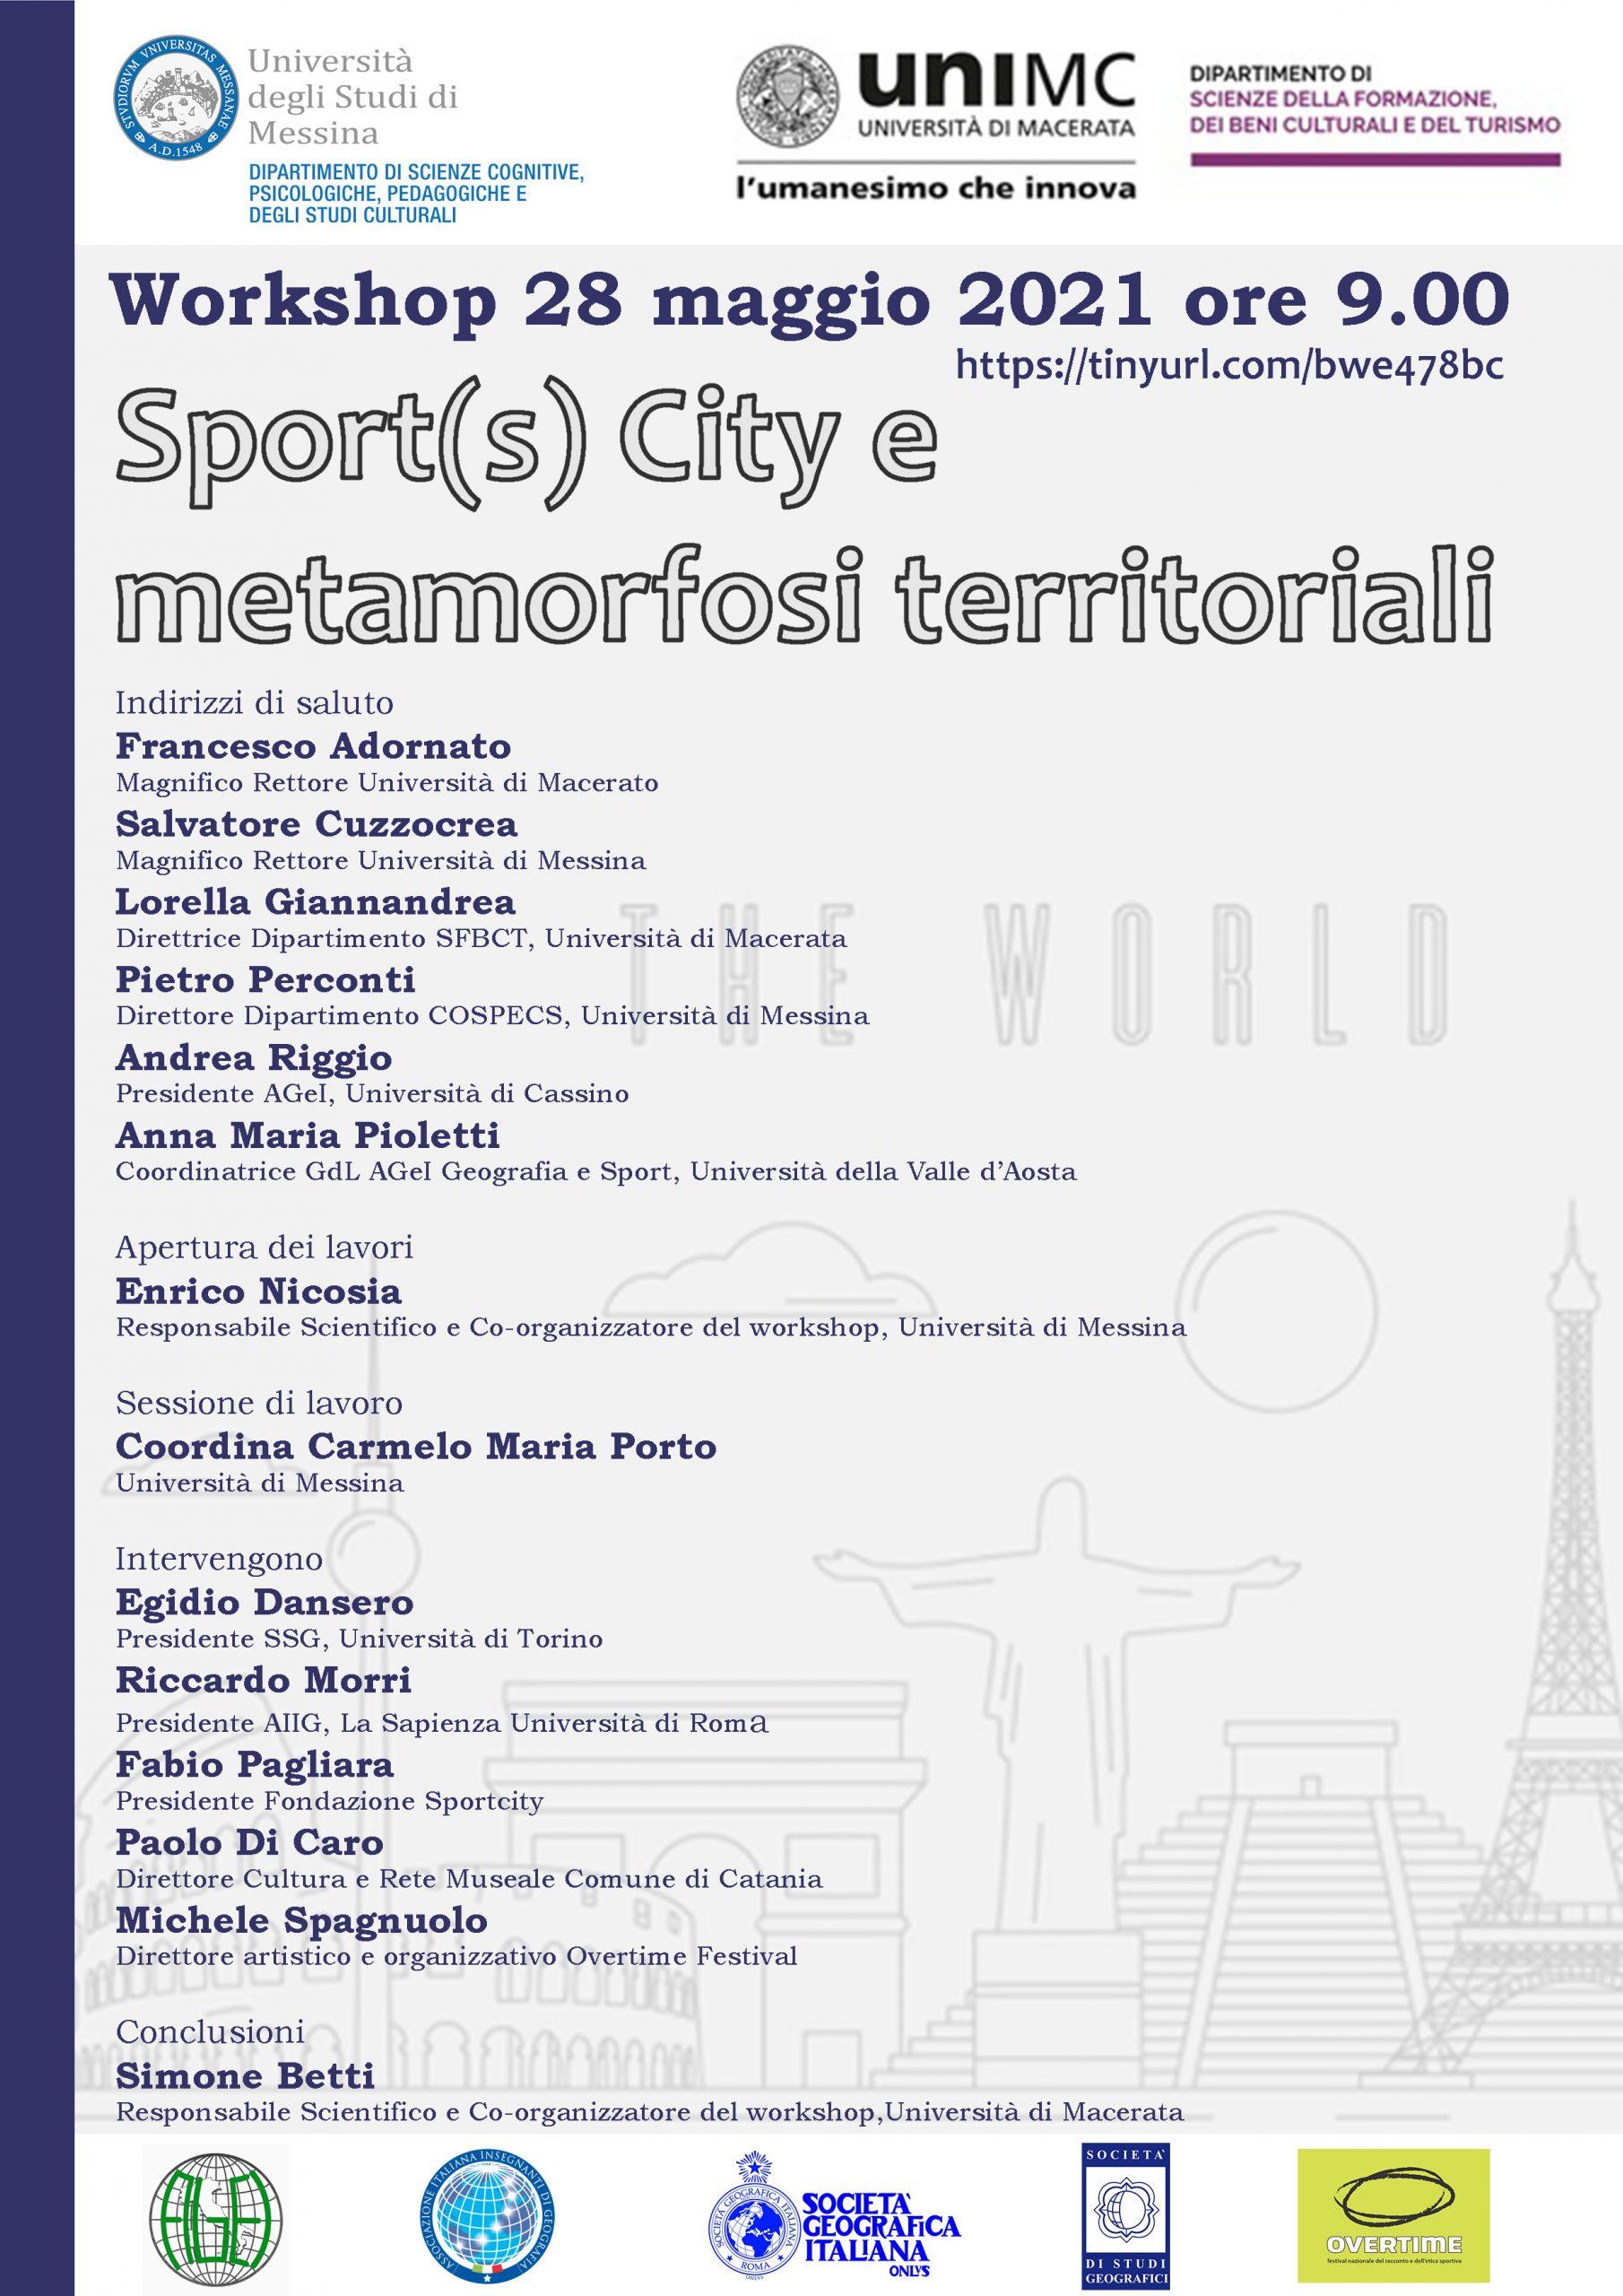 Sport(s) City e metamorfosi territoriali (28/05/2021) | AIIG